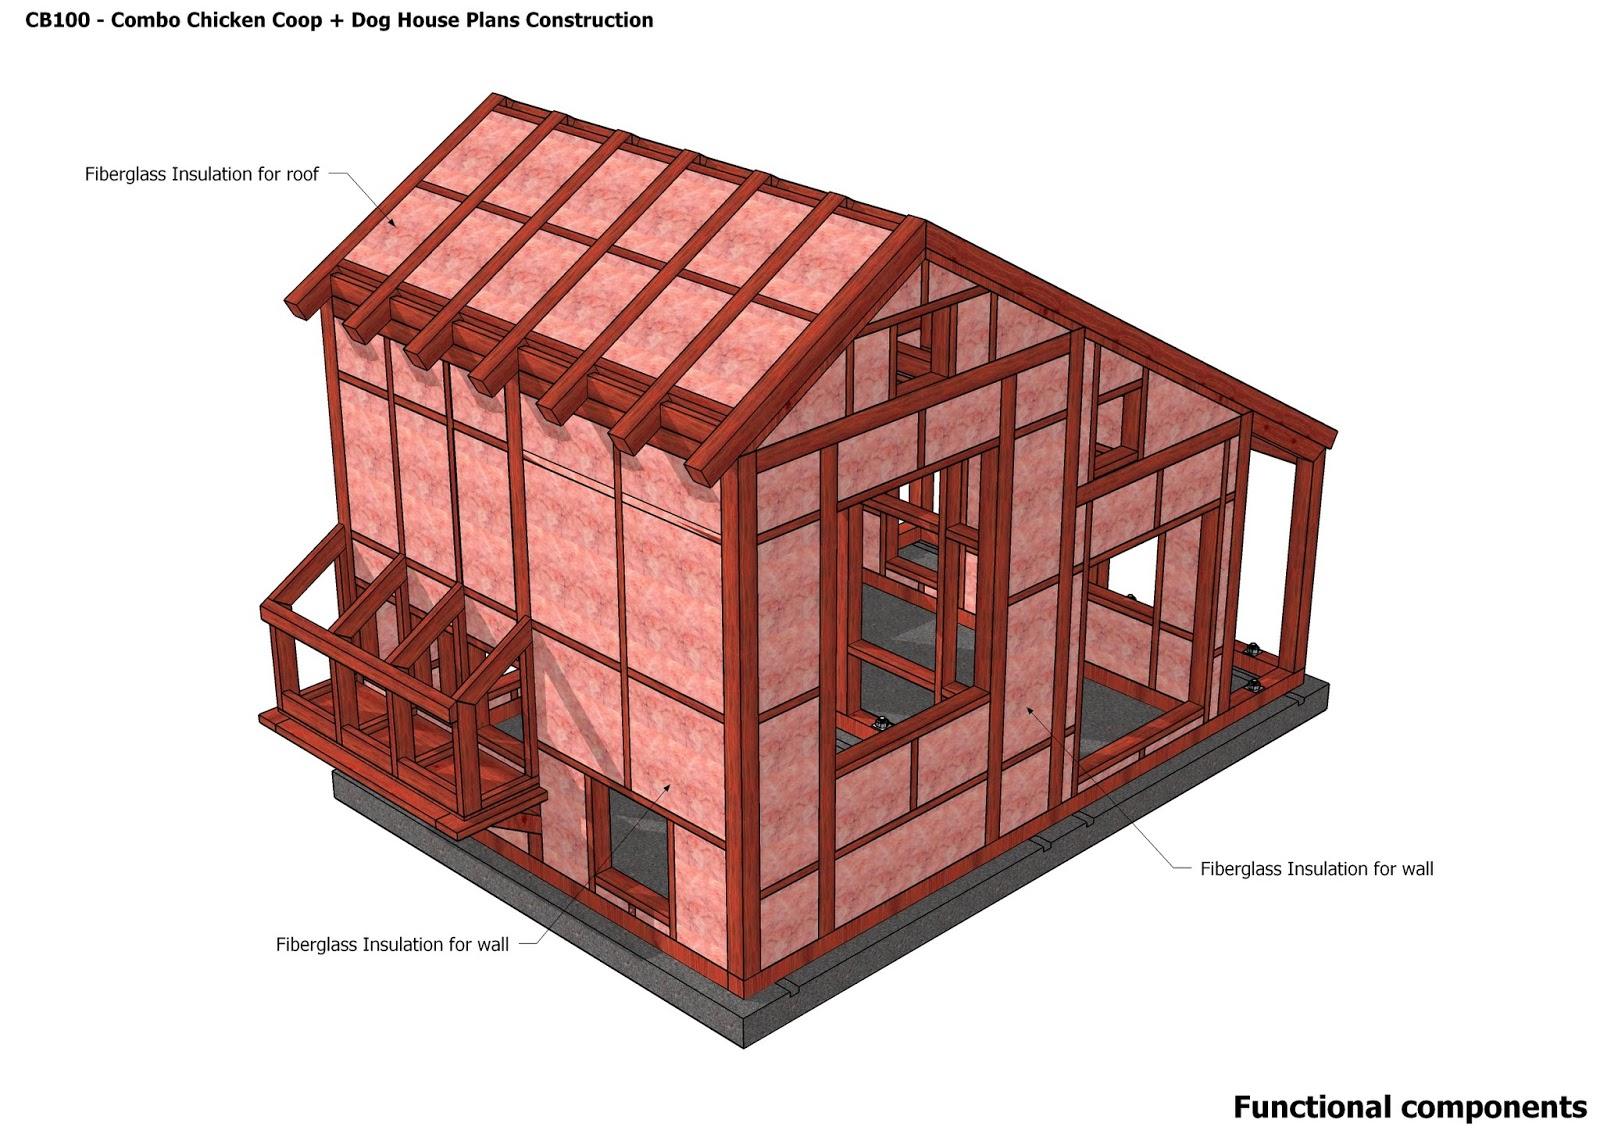 Home garden plans cb100 combo plans chicken coop for Dog kennel floor plans